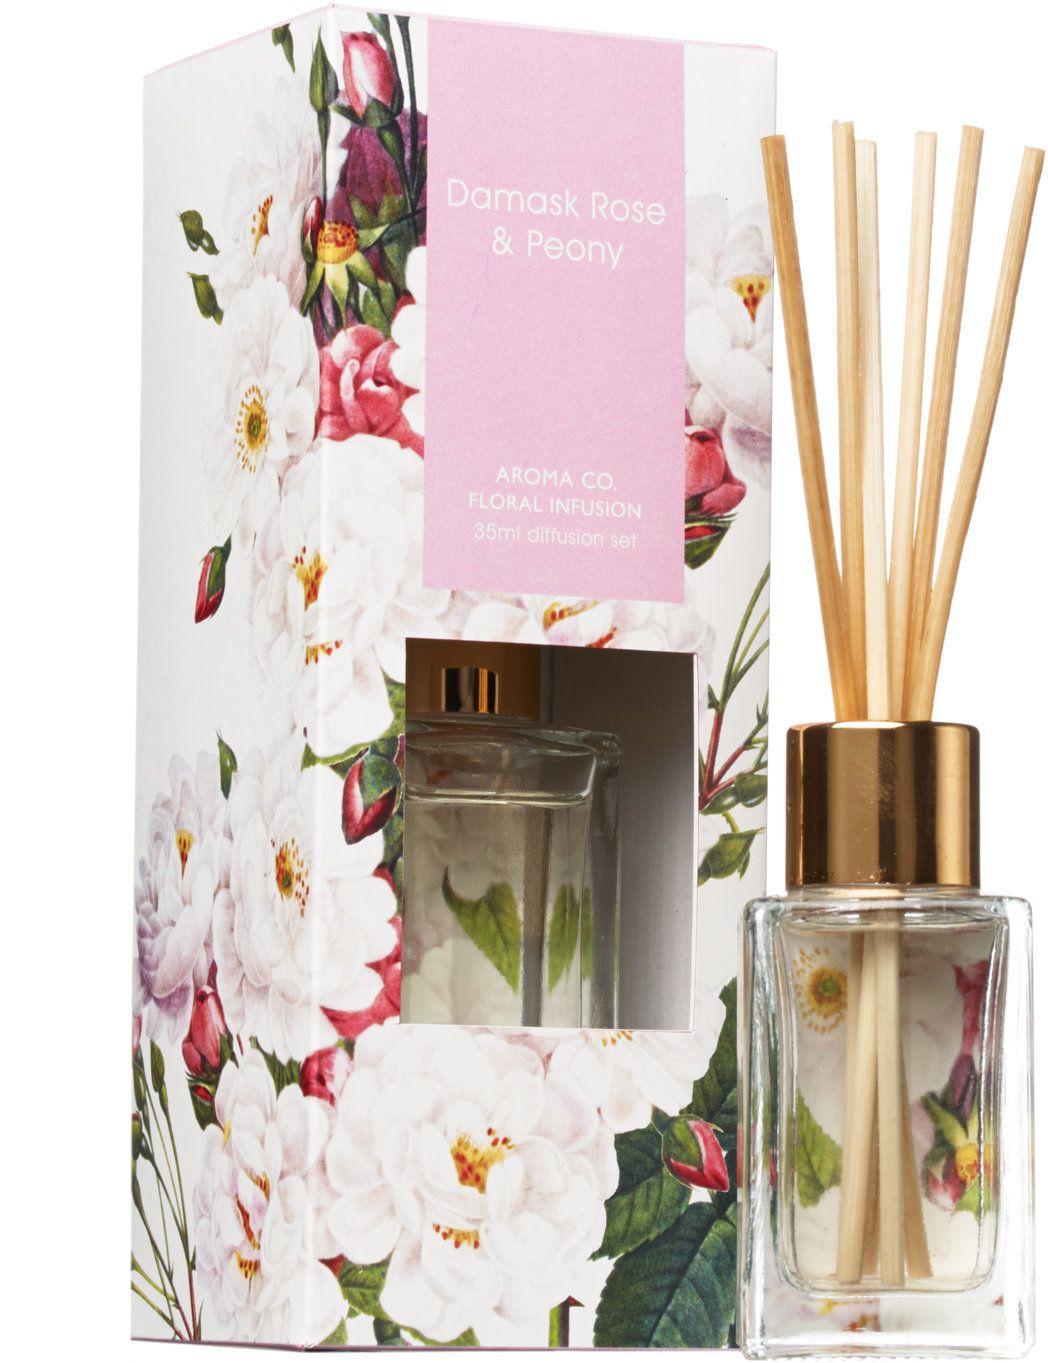 Aromatherapy Company Damask Rose amp Peony 35ml Diffuser